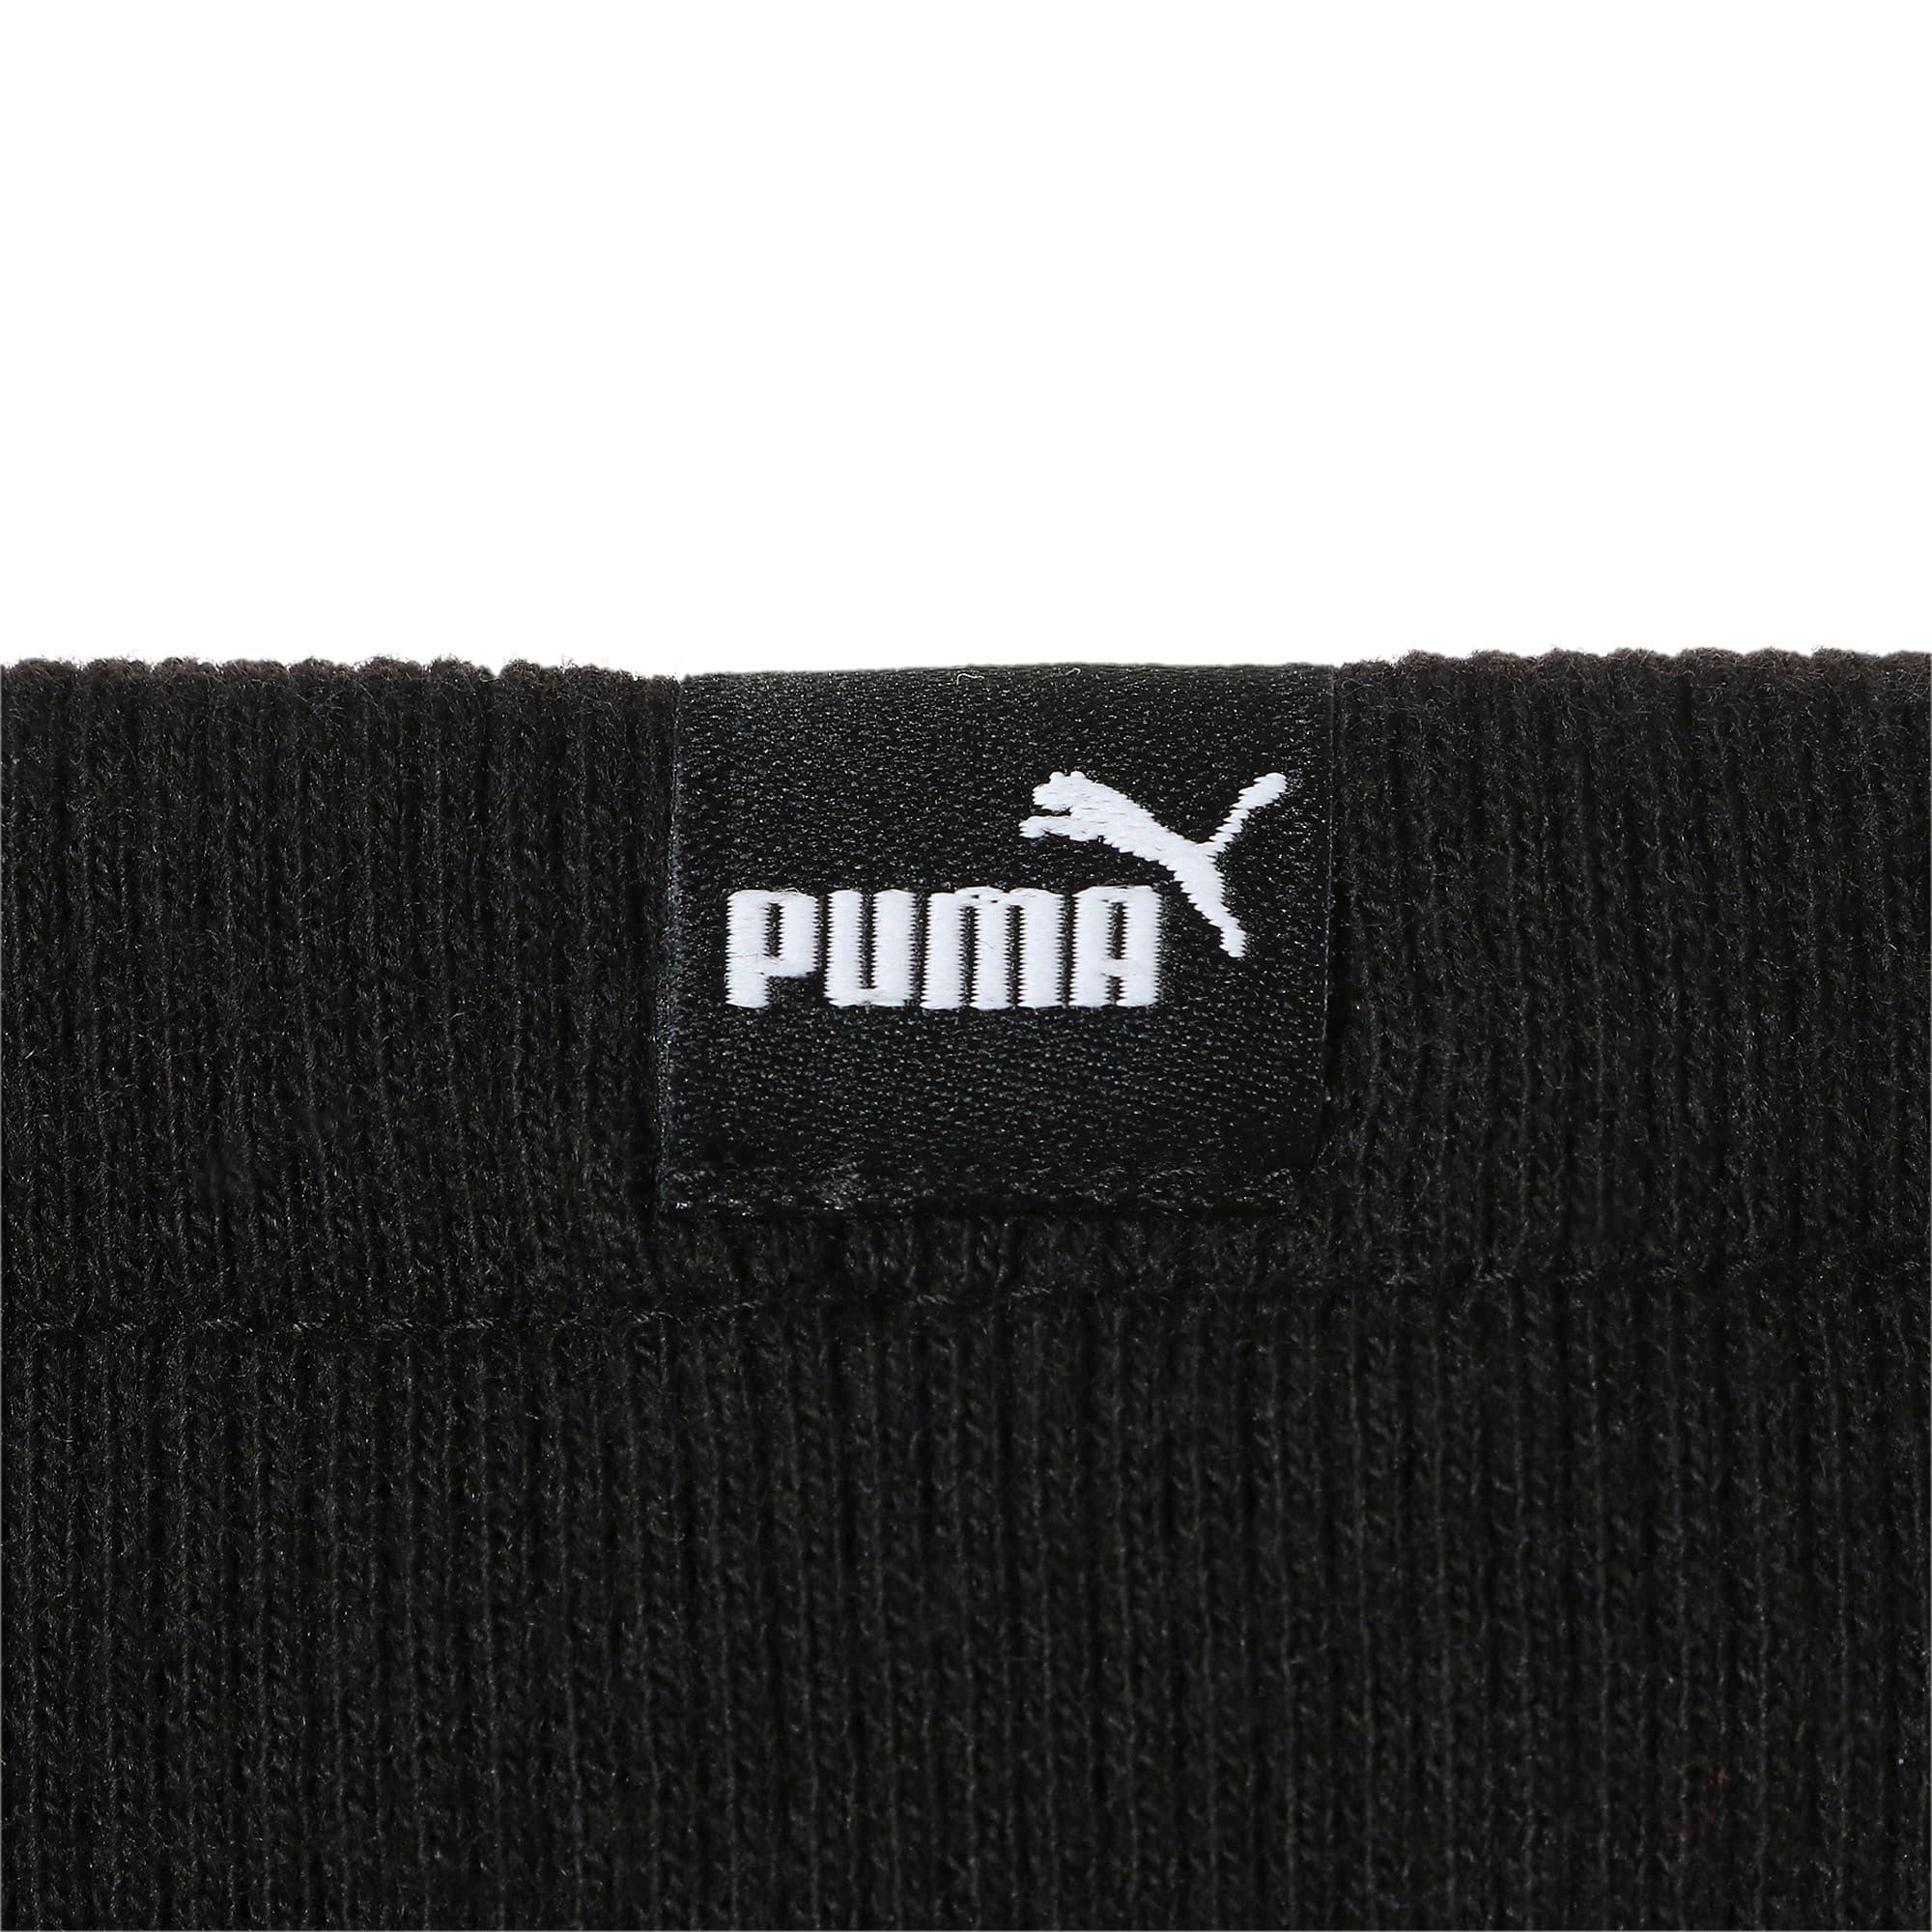 Thumbnail 7 of ESS ウィメンズ スウェットパンツ, Cotton Black, medium-JPN